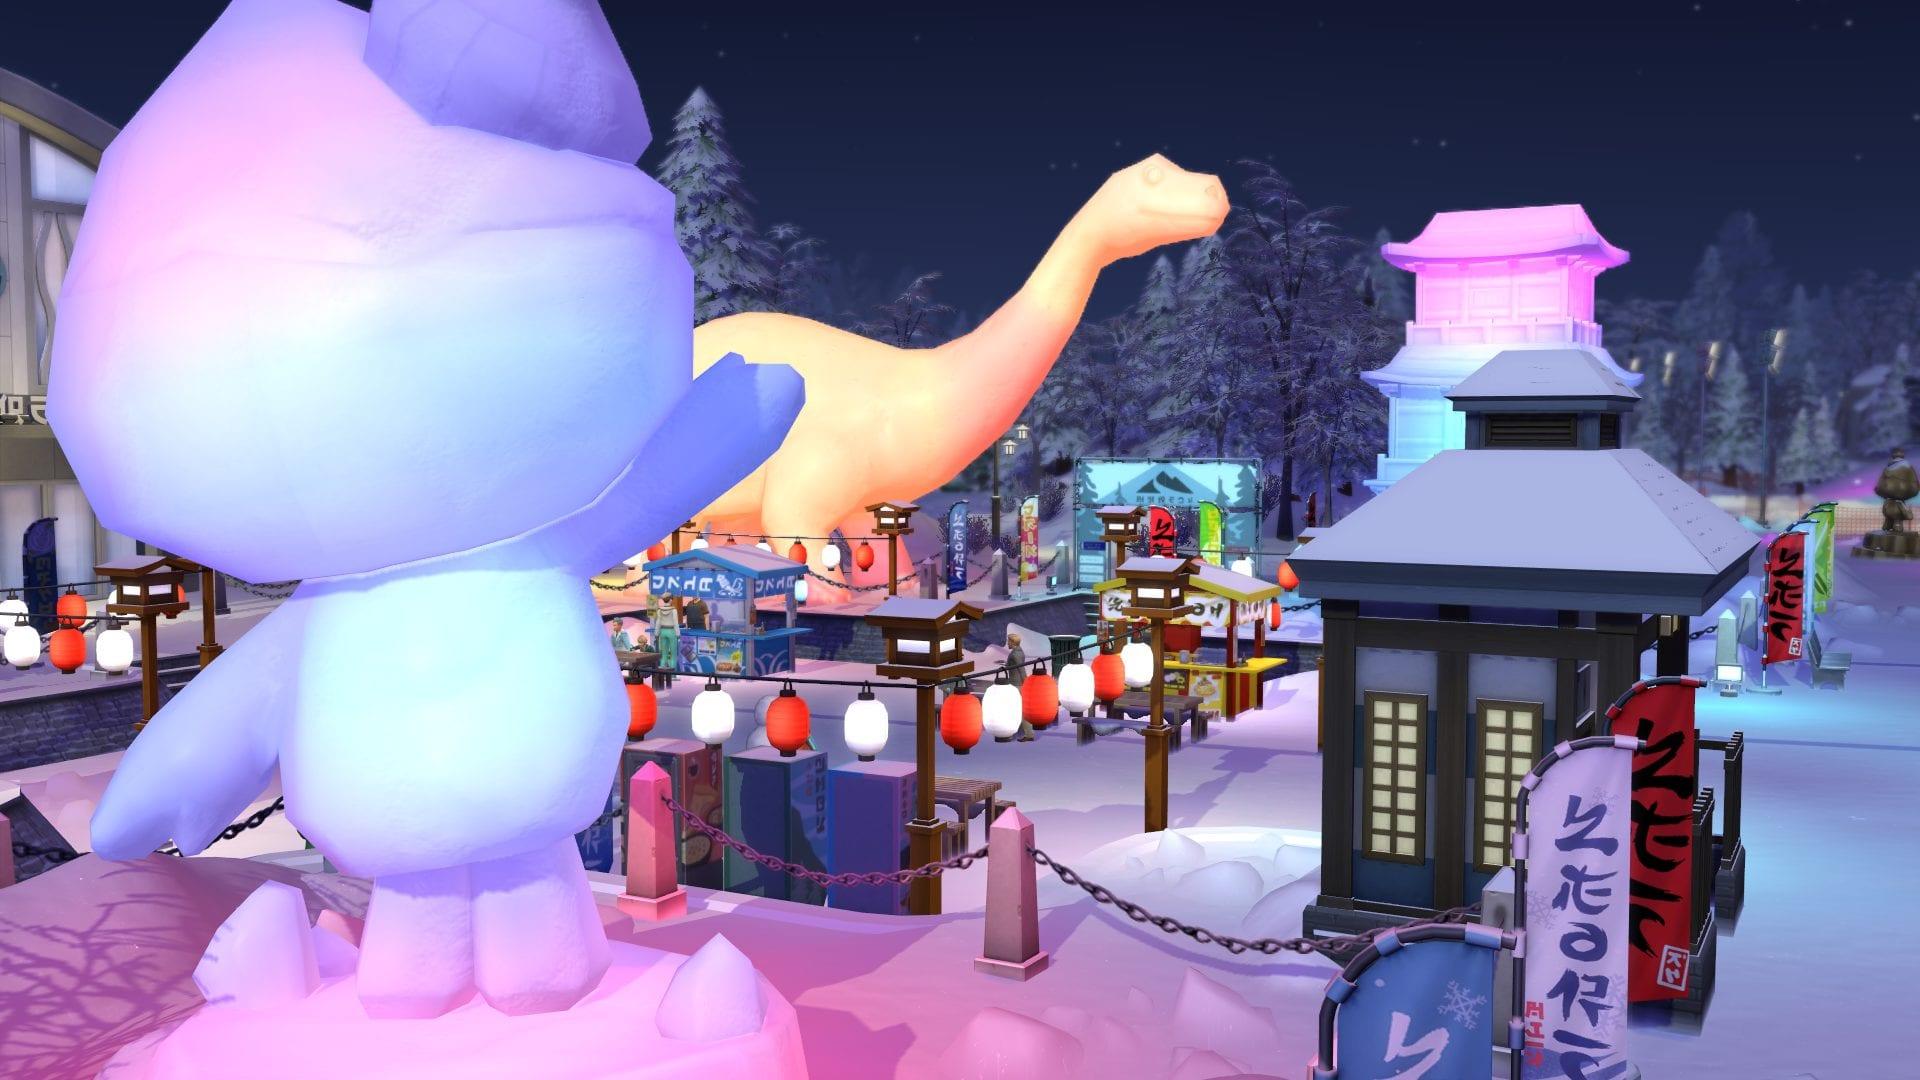 Sims 4 Ab ins Schneeparadies Festival Event